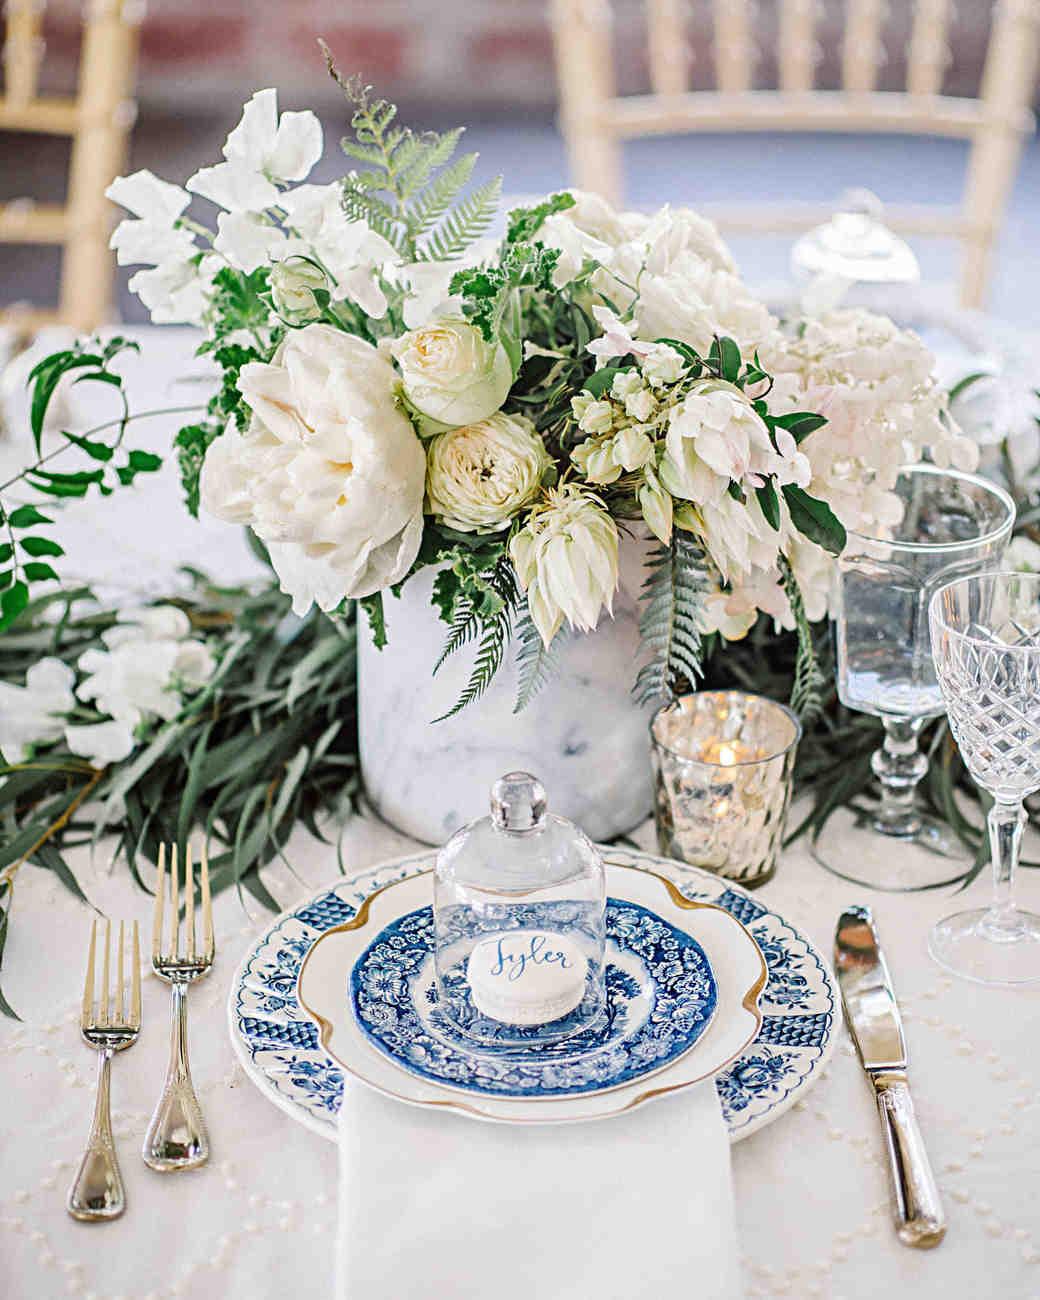 sand vases for wedding ceremony of 79 white wedding centerpieces martha stewart weddings regarding hannah steve wedding california china macarons